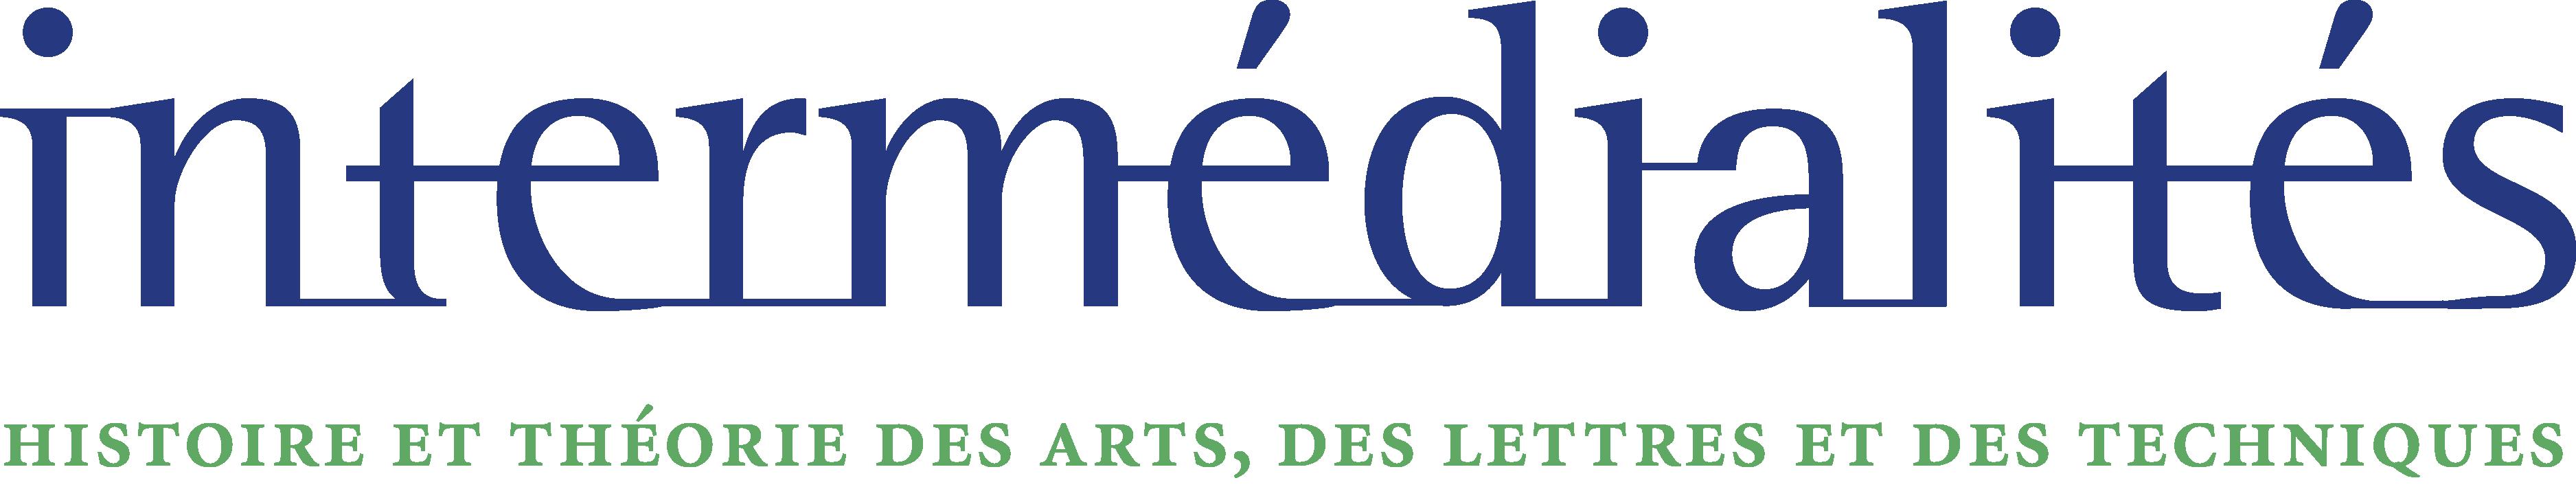 intermedialites logo